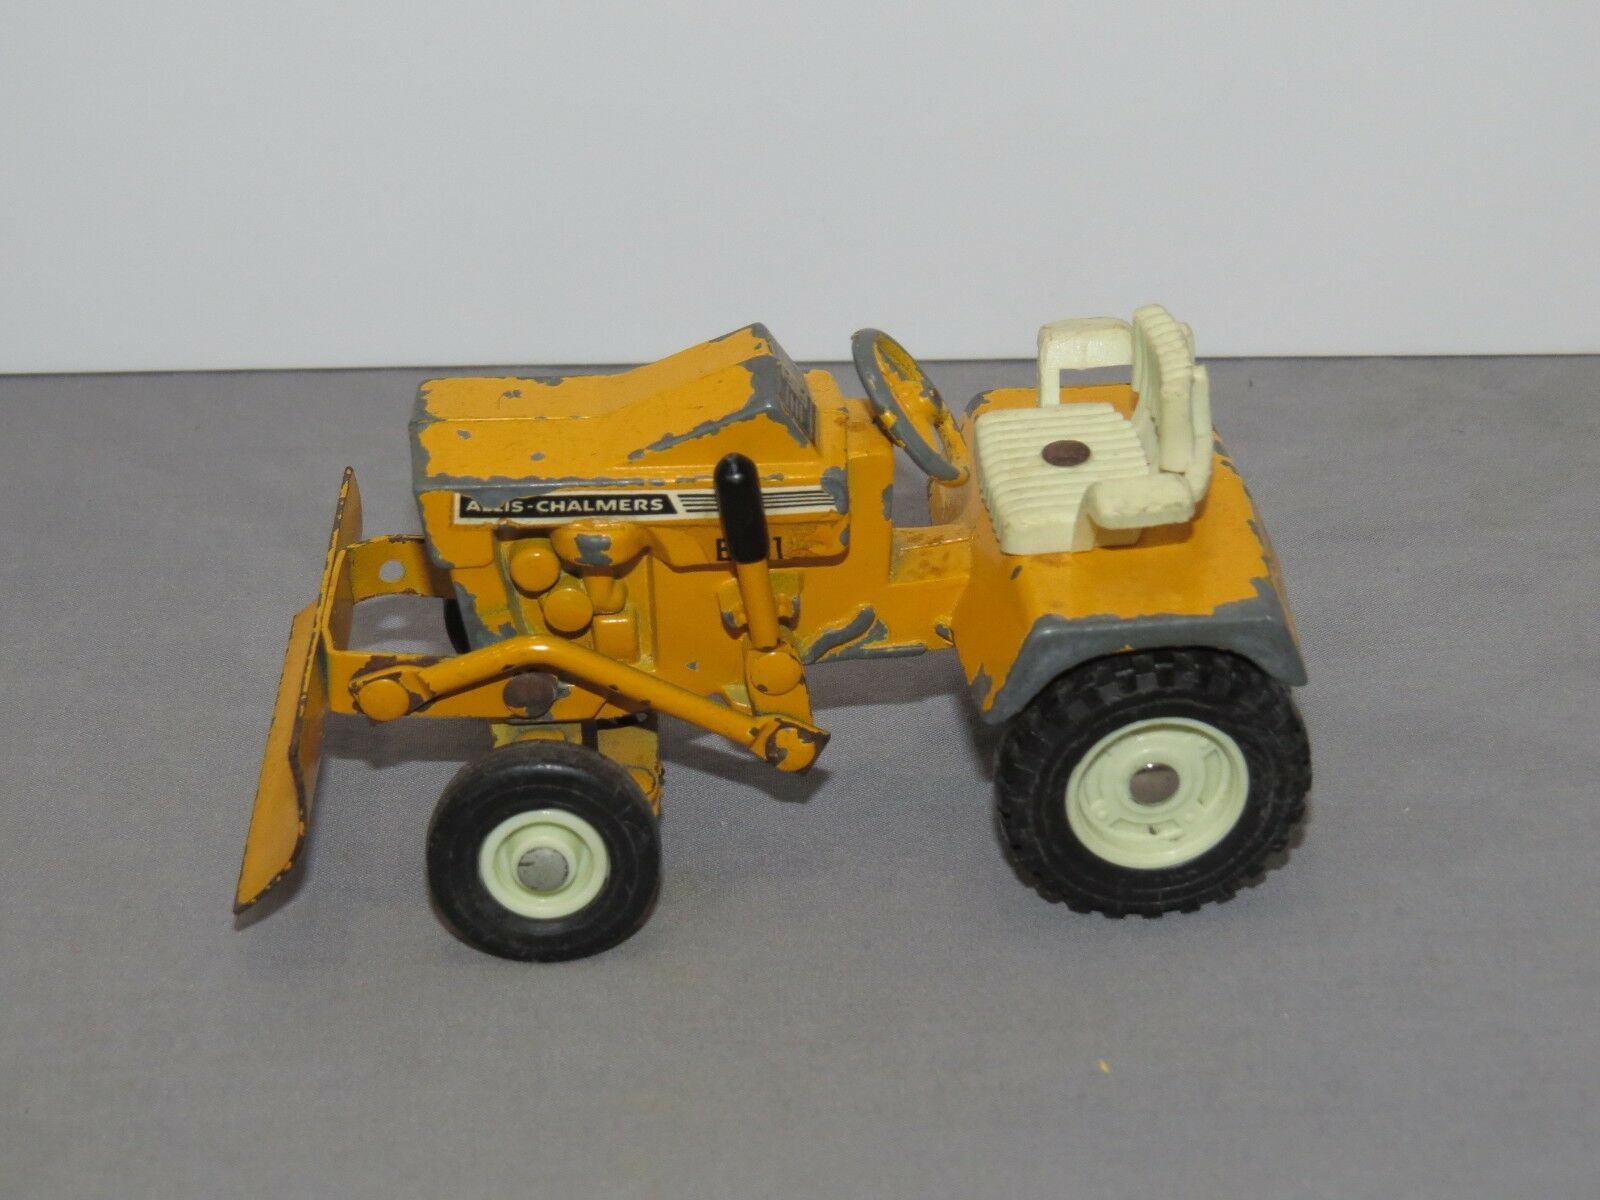 Vintage Ertl Allis Chalmers B-112 Lawn & Garden Toy Tractor 1 16 Original NICE